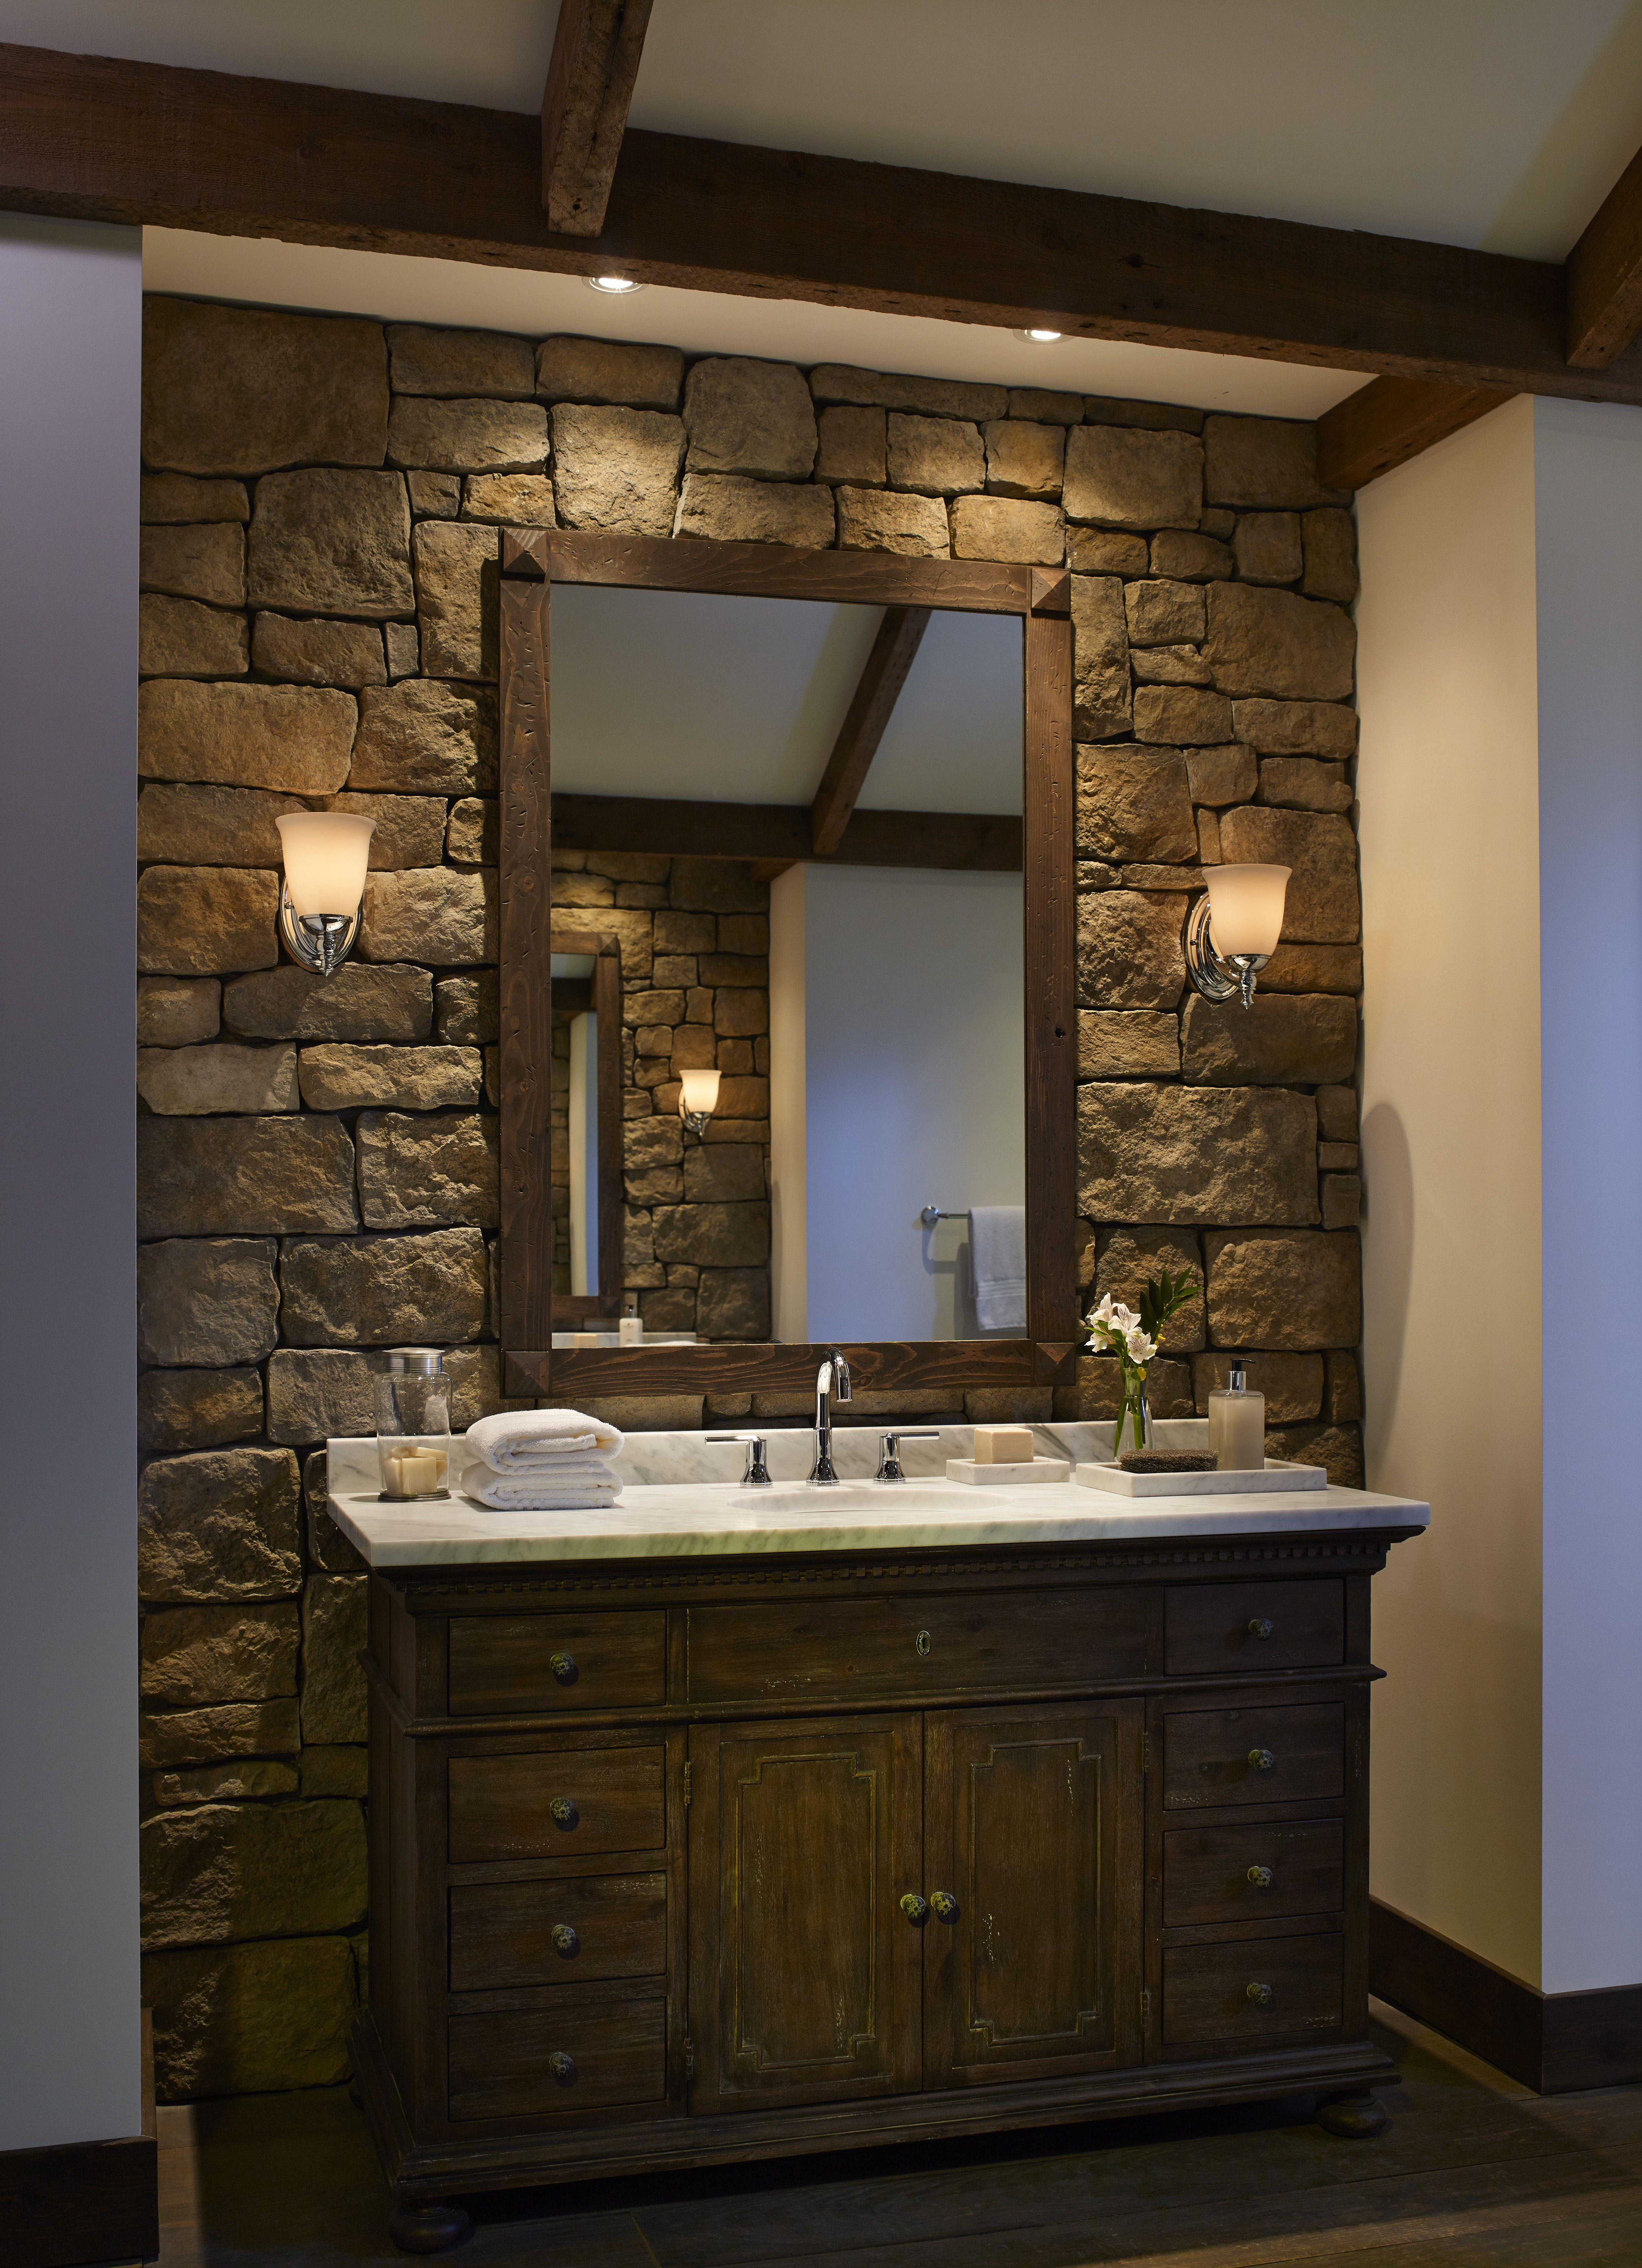 Eldorado Stone - Imagine - Inspiration Gallery - Residential - Baths ...